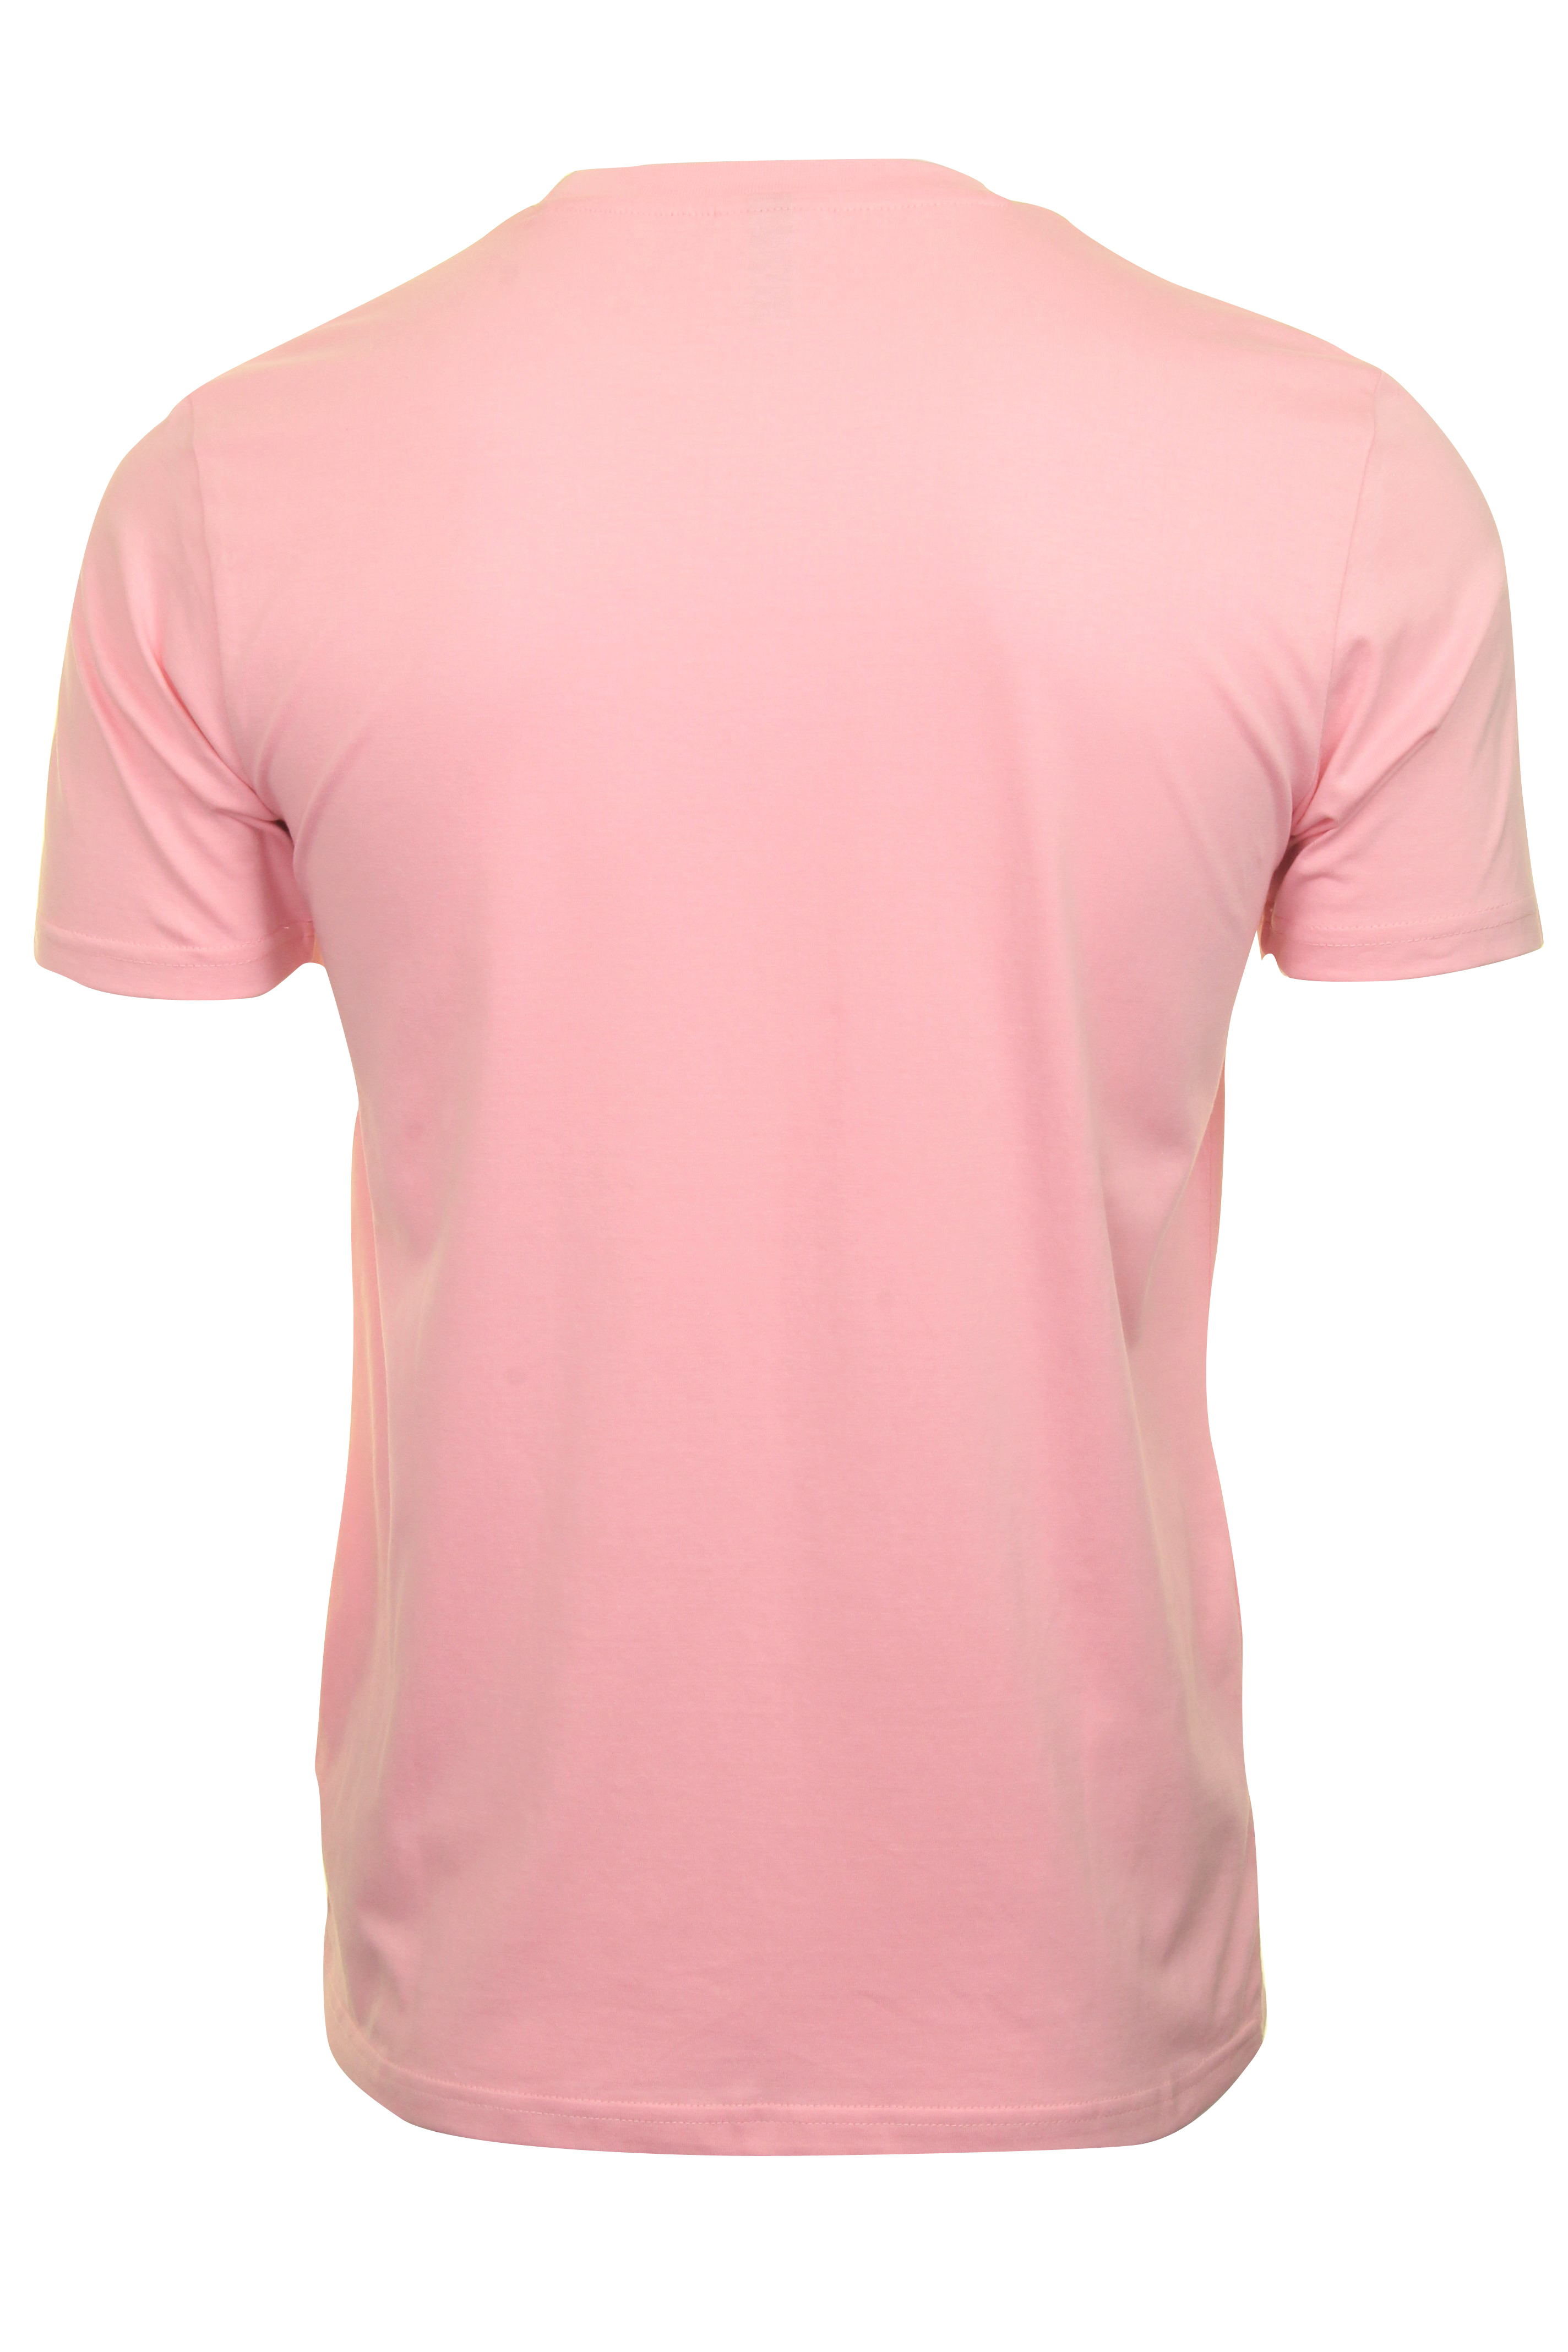 Mens-Ellesse-T-Shirt-039-Prado-039-Short-Sleeved thumbnail 15